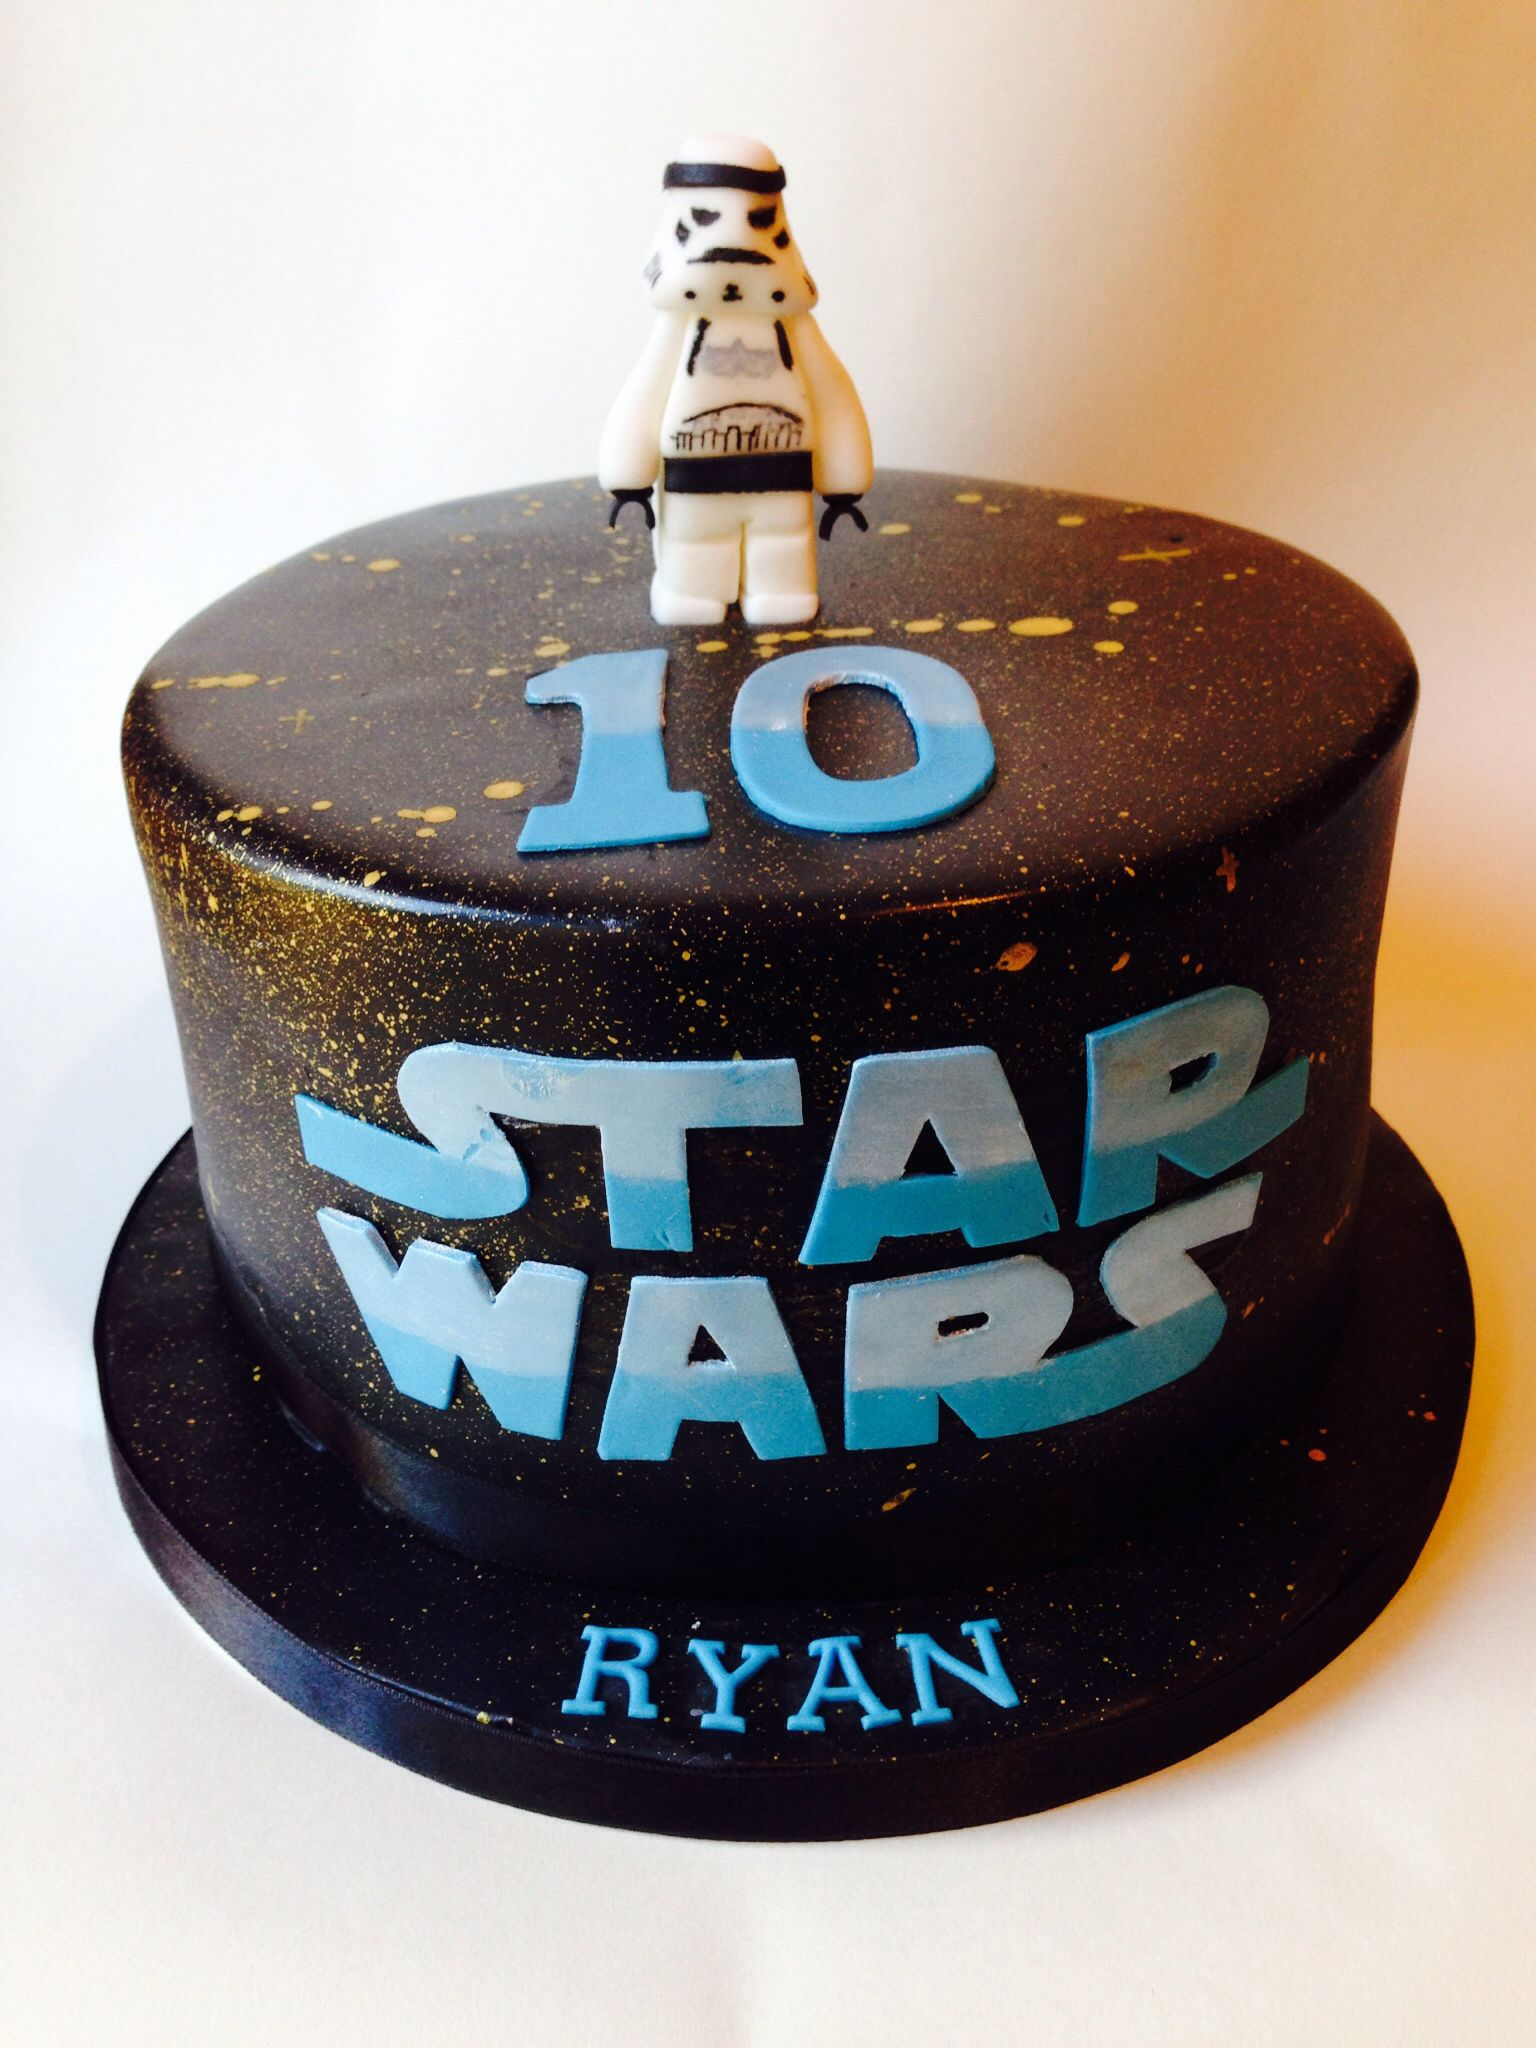 Lego star wars cake lego star wars cake star wars cake